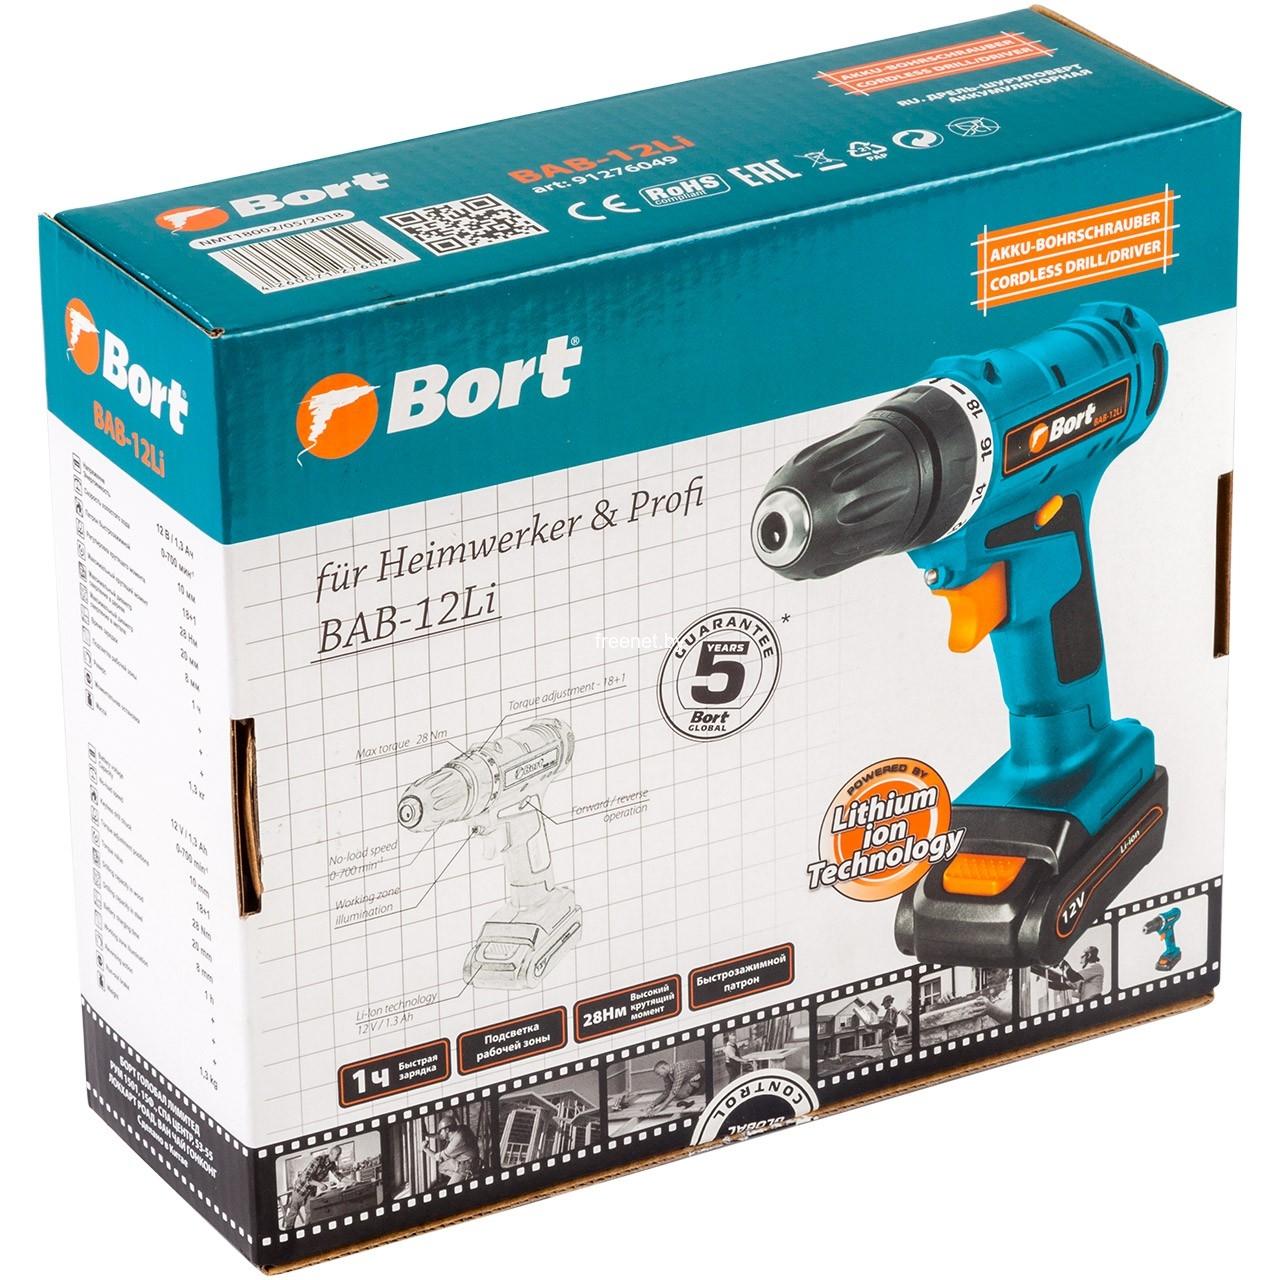 Bort BAB-12Li купить в Минске с доставкой — FREENET.BY